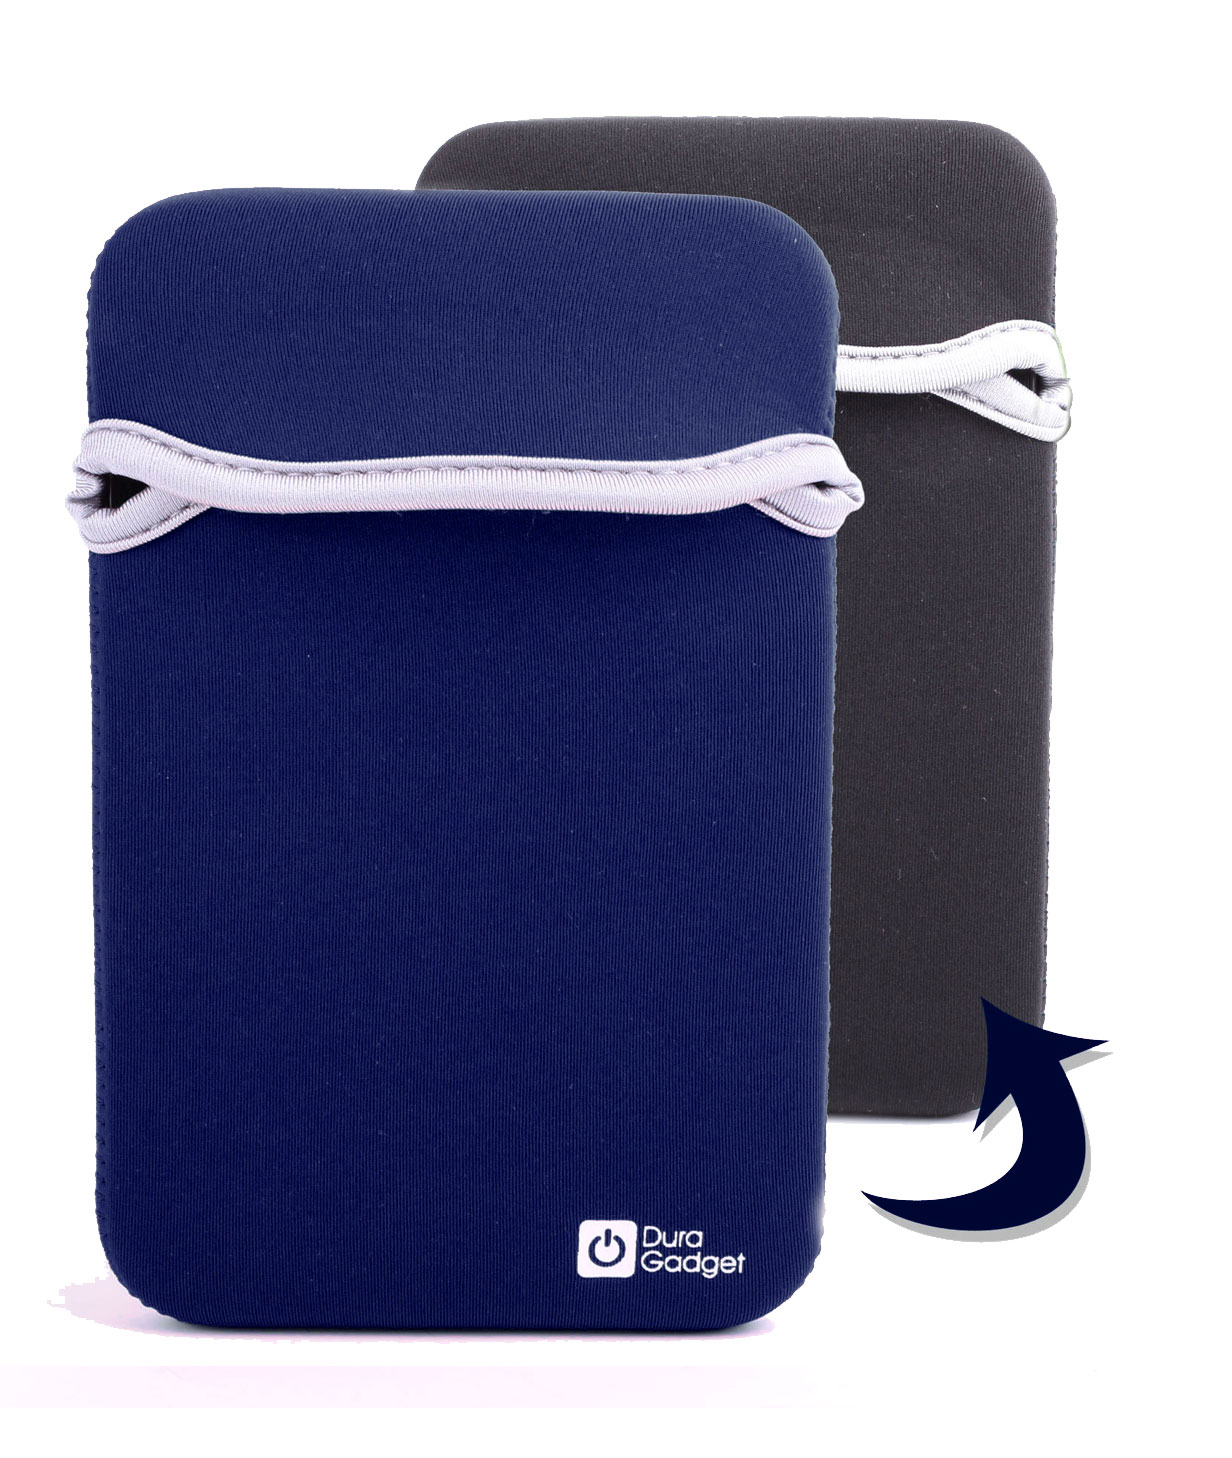 Tui housse noir bleu en n opr ne pour tablette ipad mini for Housse neoprene ipad